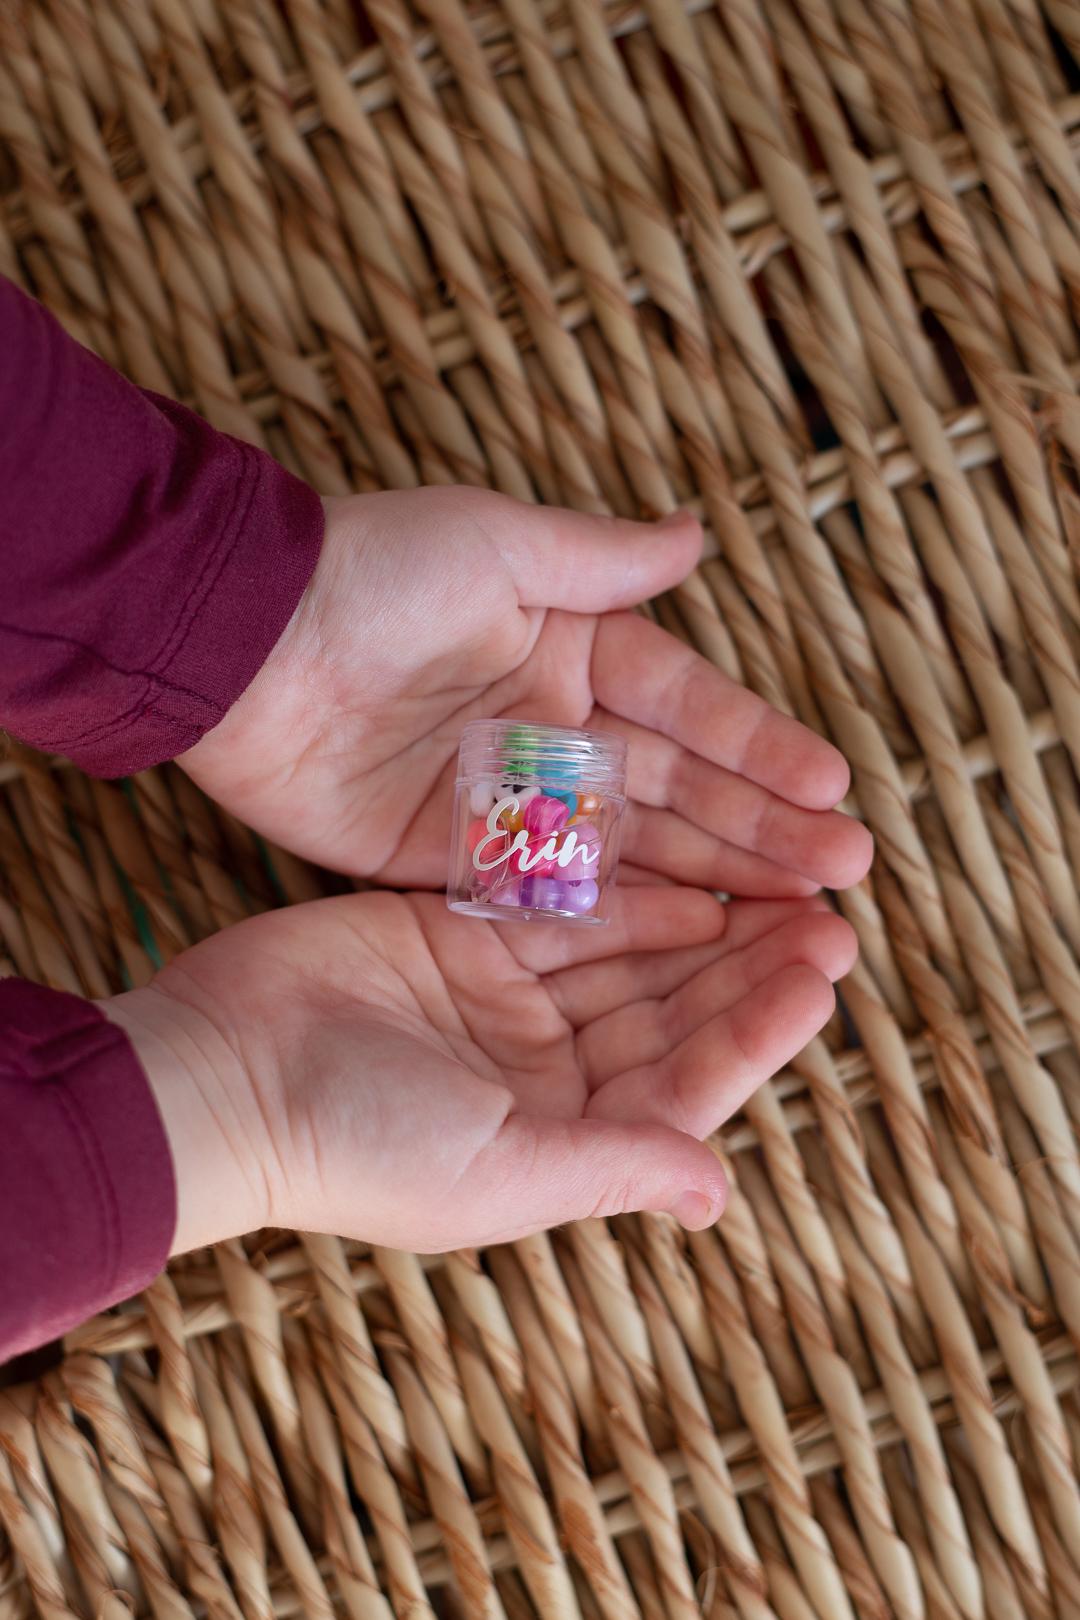 Party Favour Idea for rainbow party - DIY stretchy bracelet kit